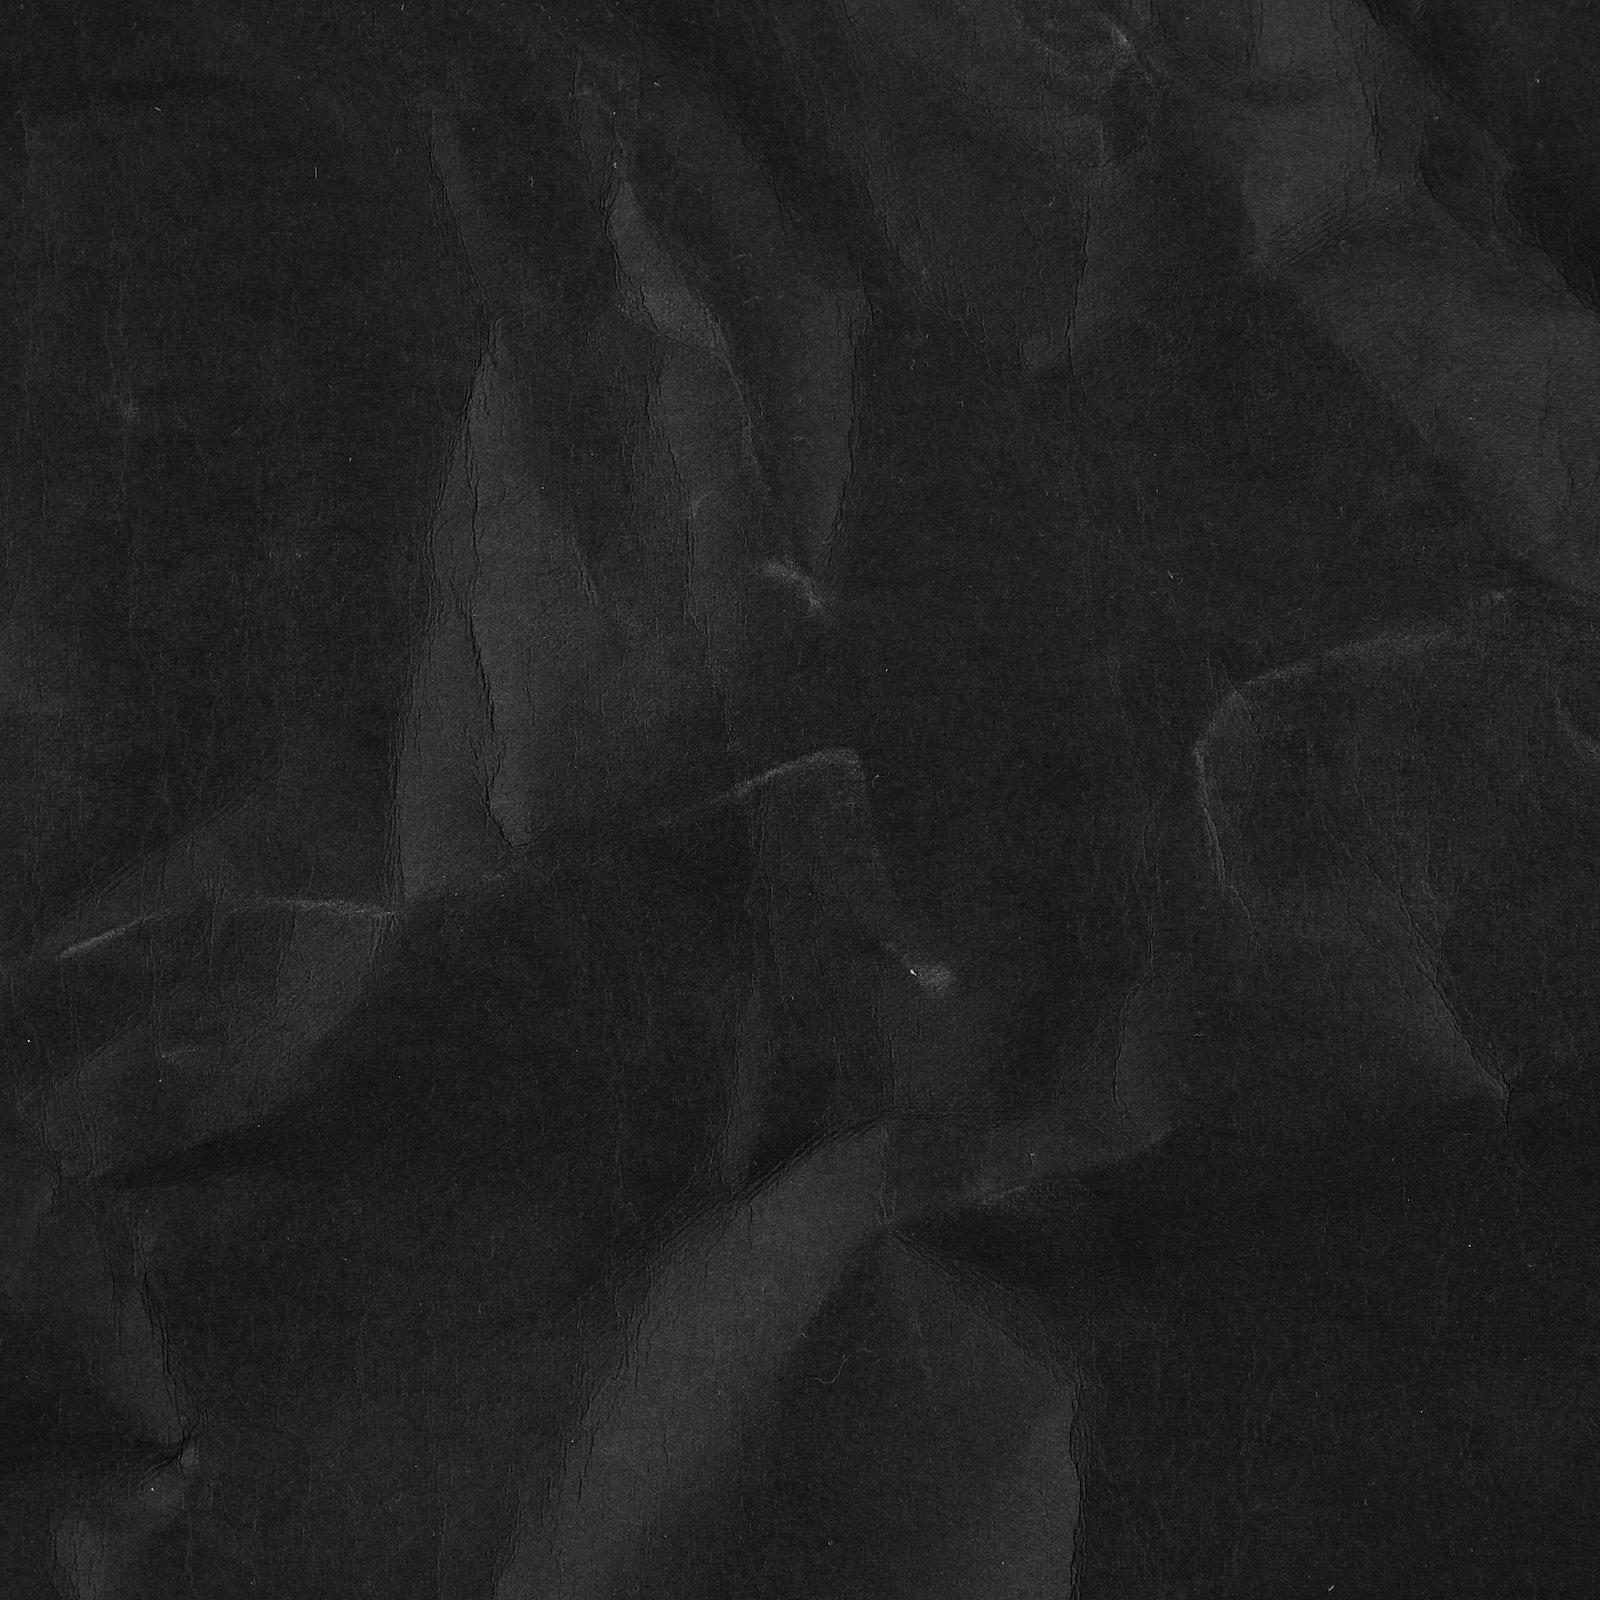 PAP FAB black 75x100cm 95500_pack_b